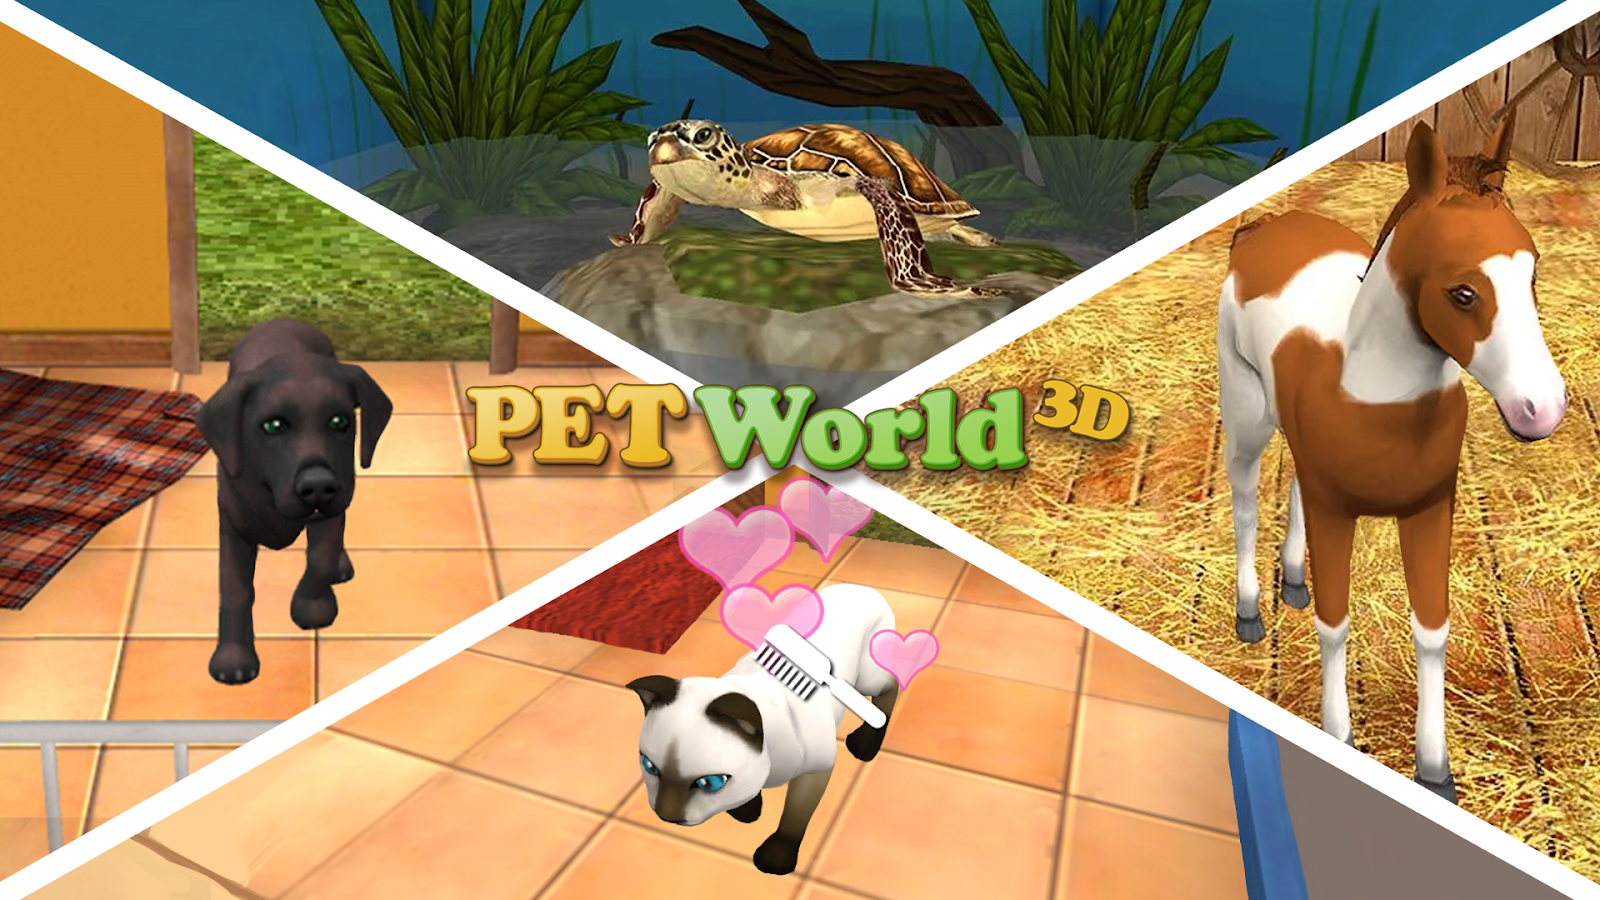 com tivola petworld rescue gp 5 5 APK Download - Android Simulation